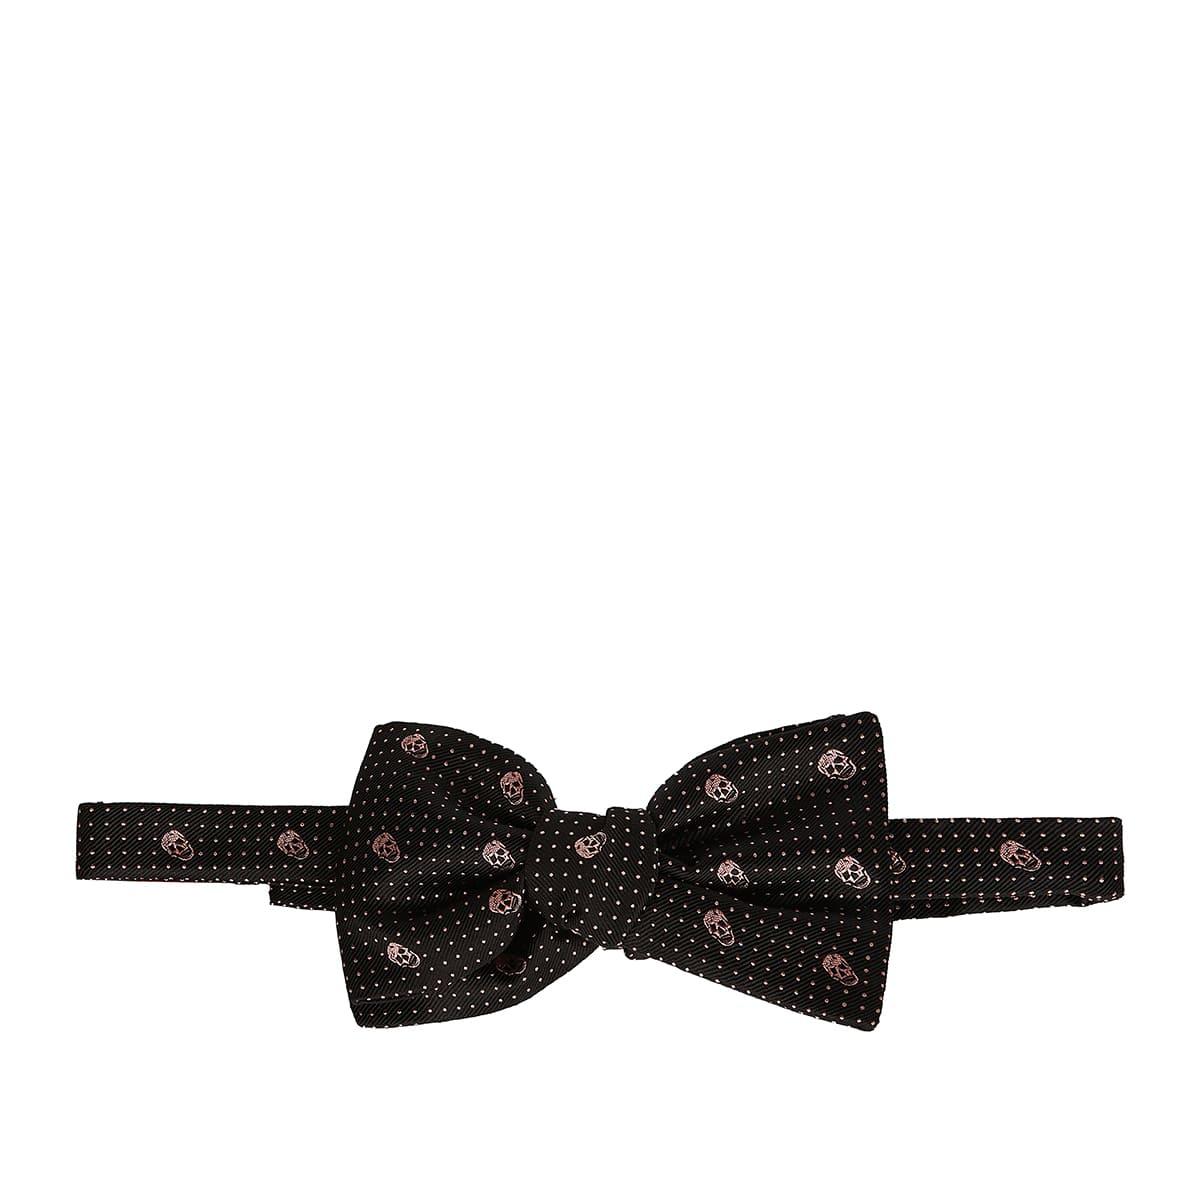 Skull printed bow tie